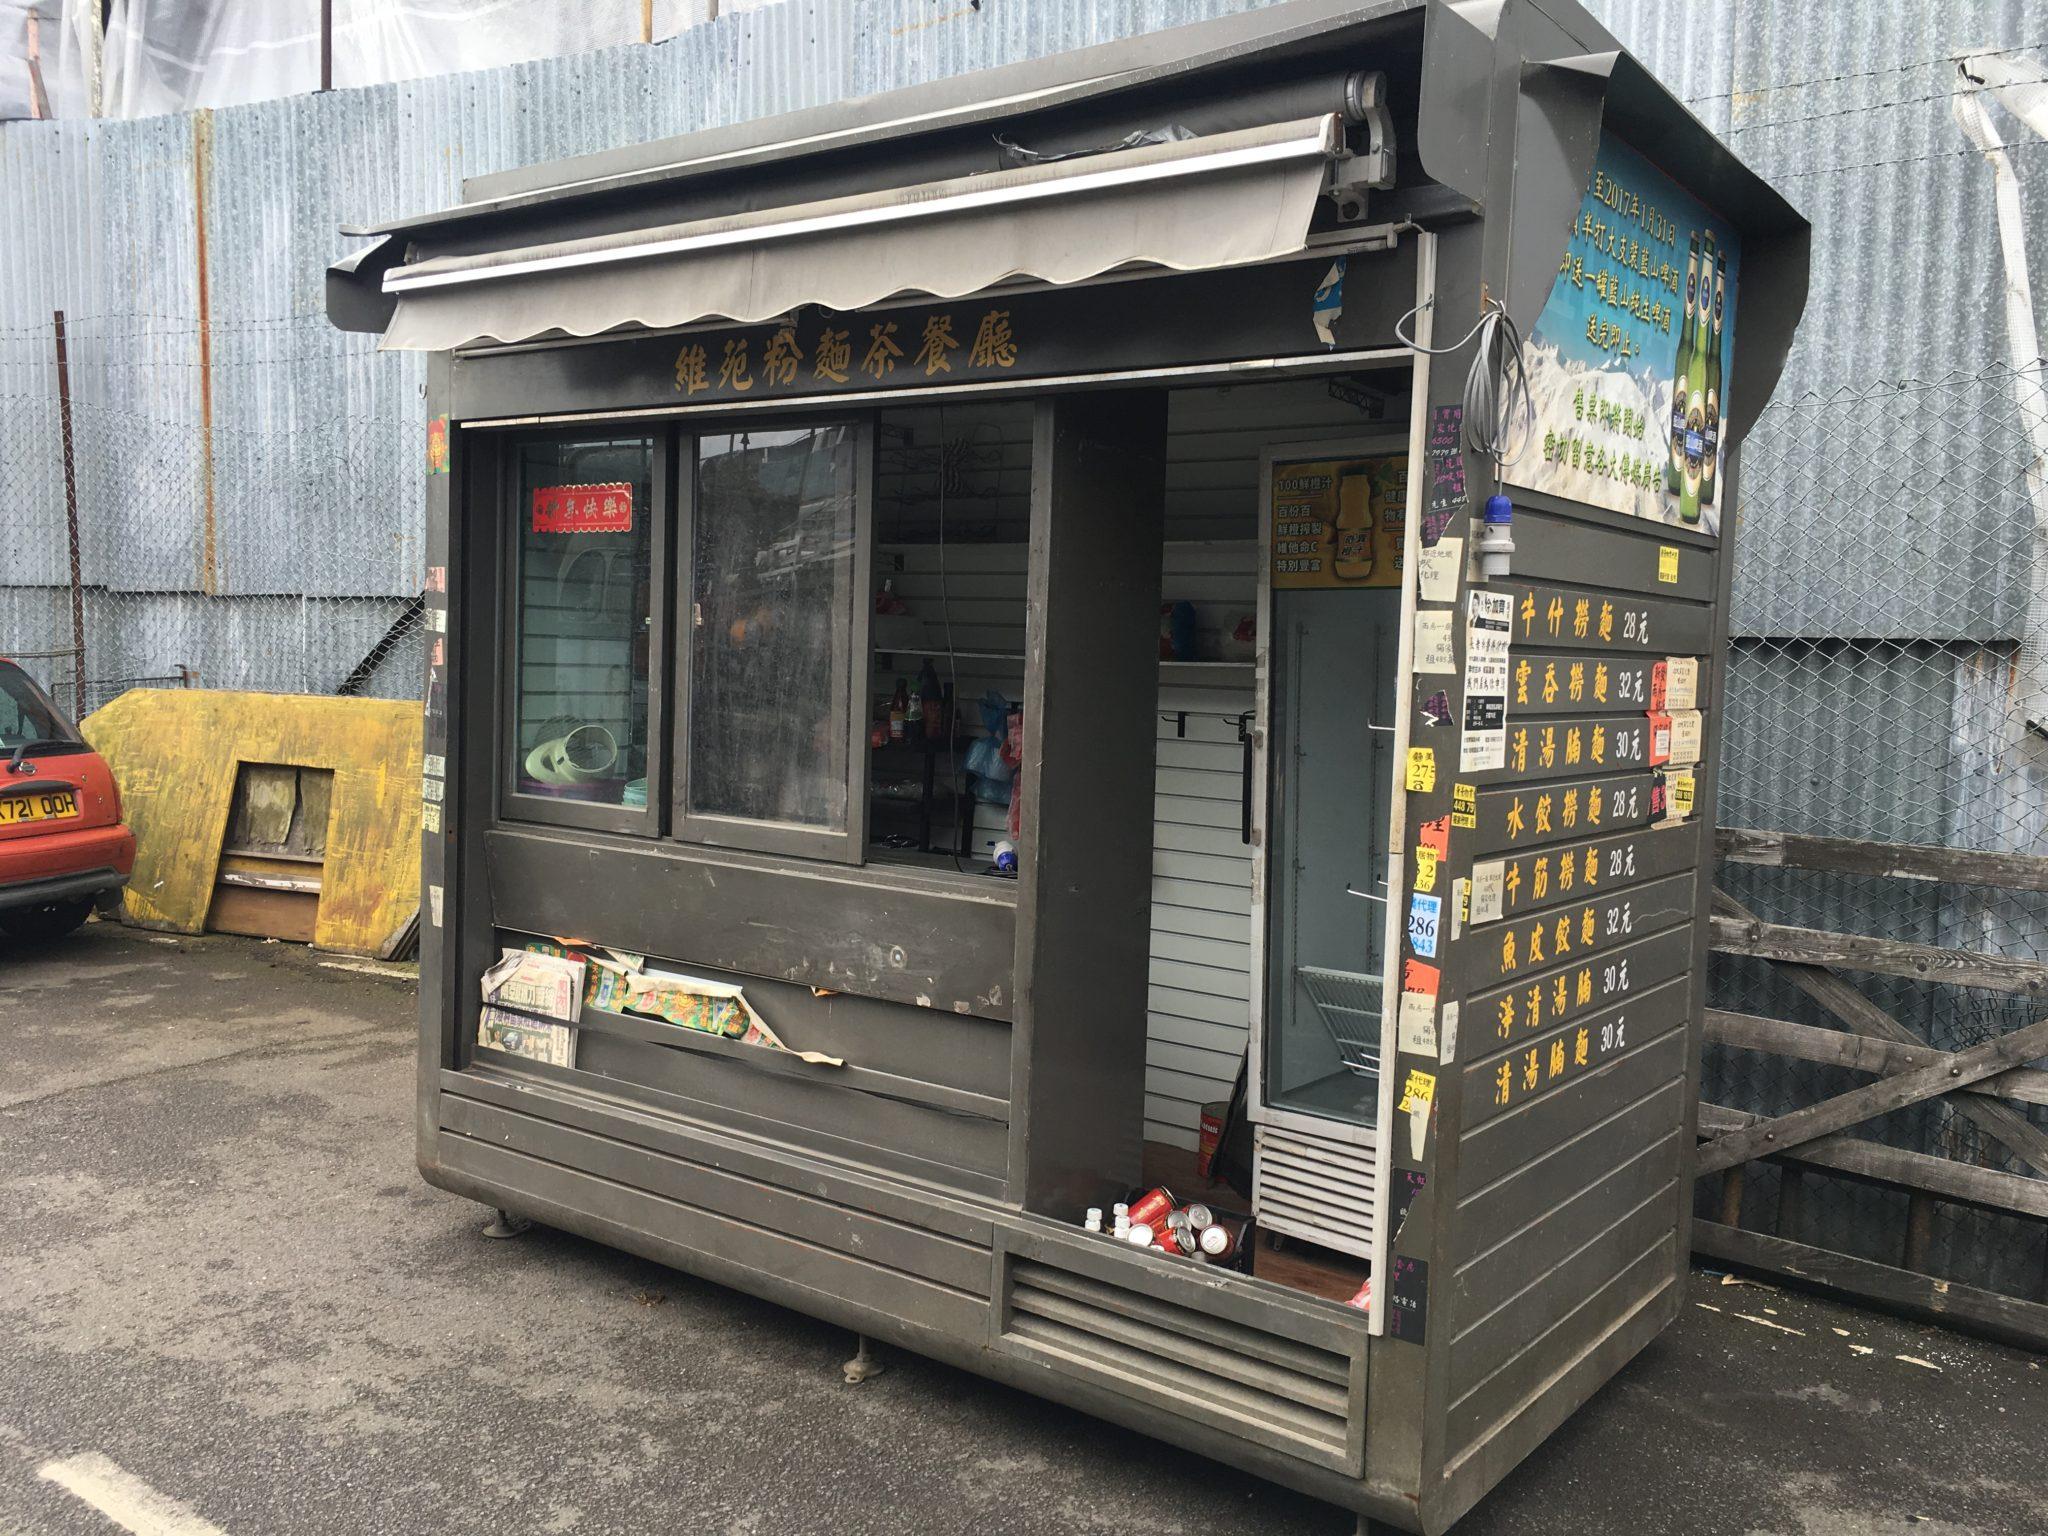 Newspaper/shop Kiosk With Awning - IMG_1922